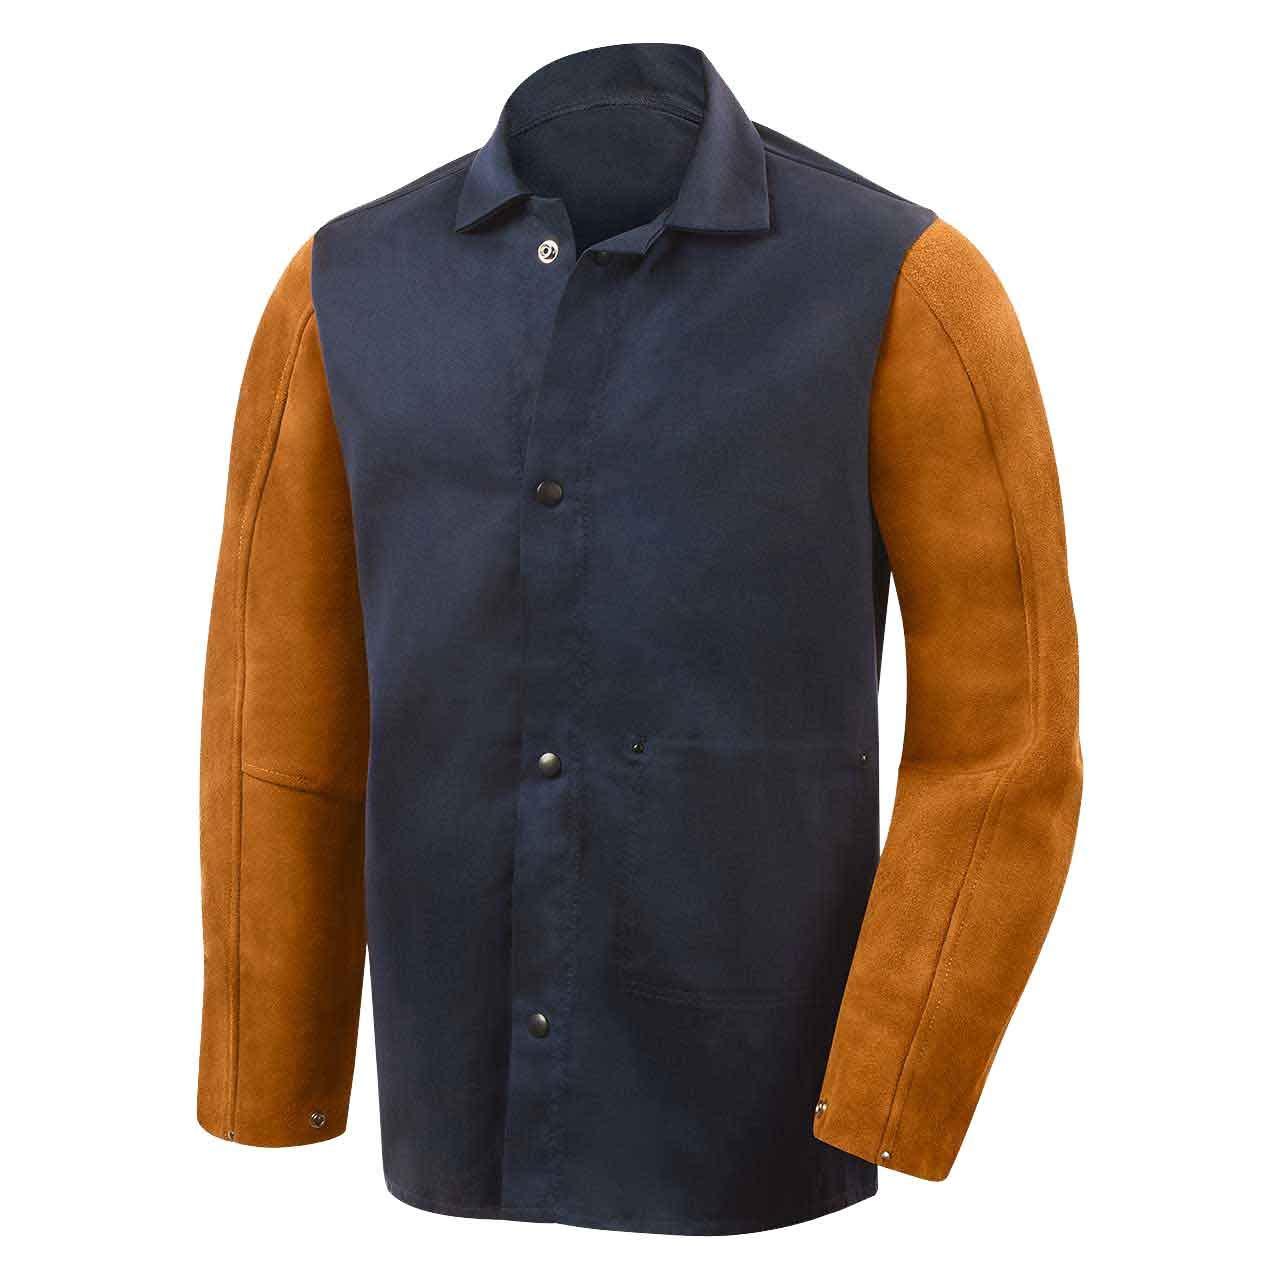 Steiner 1260-X 30-Inch Jacket, Weldlite Plus Navy Cotton, Rust Cowhide Sleeves, Extra Large